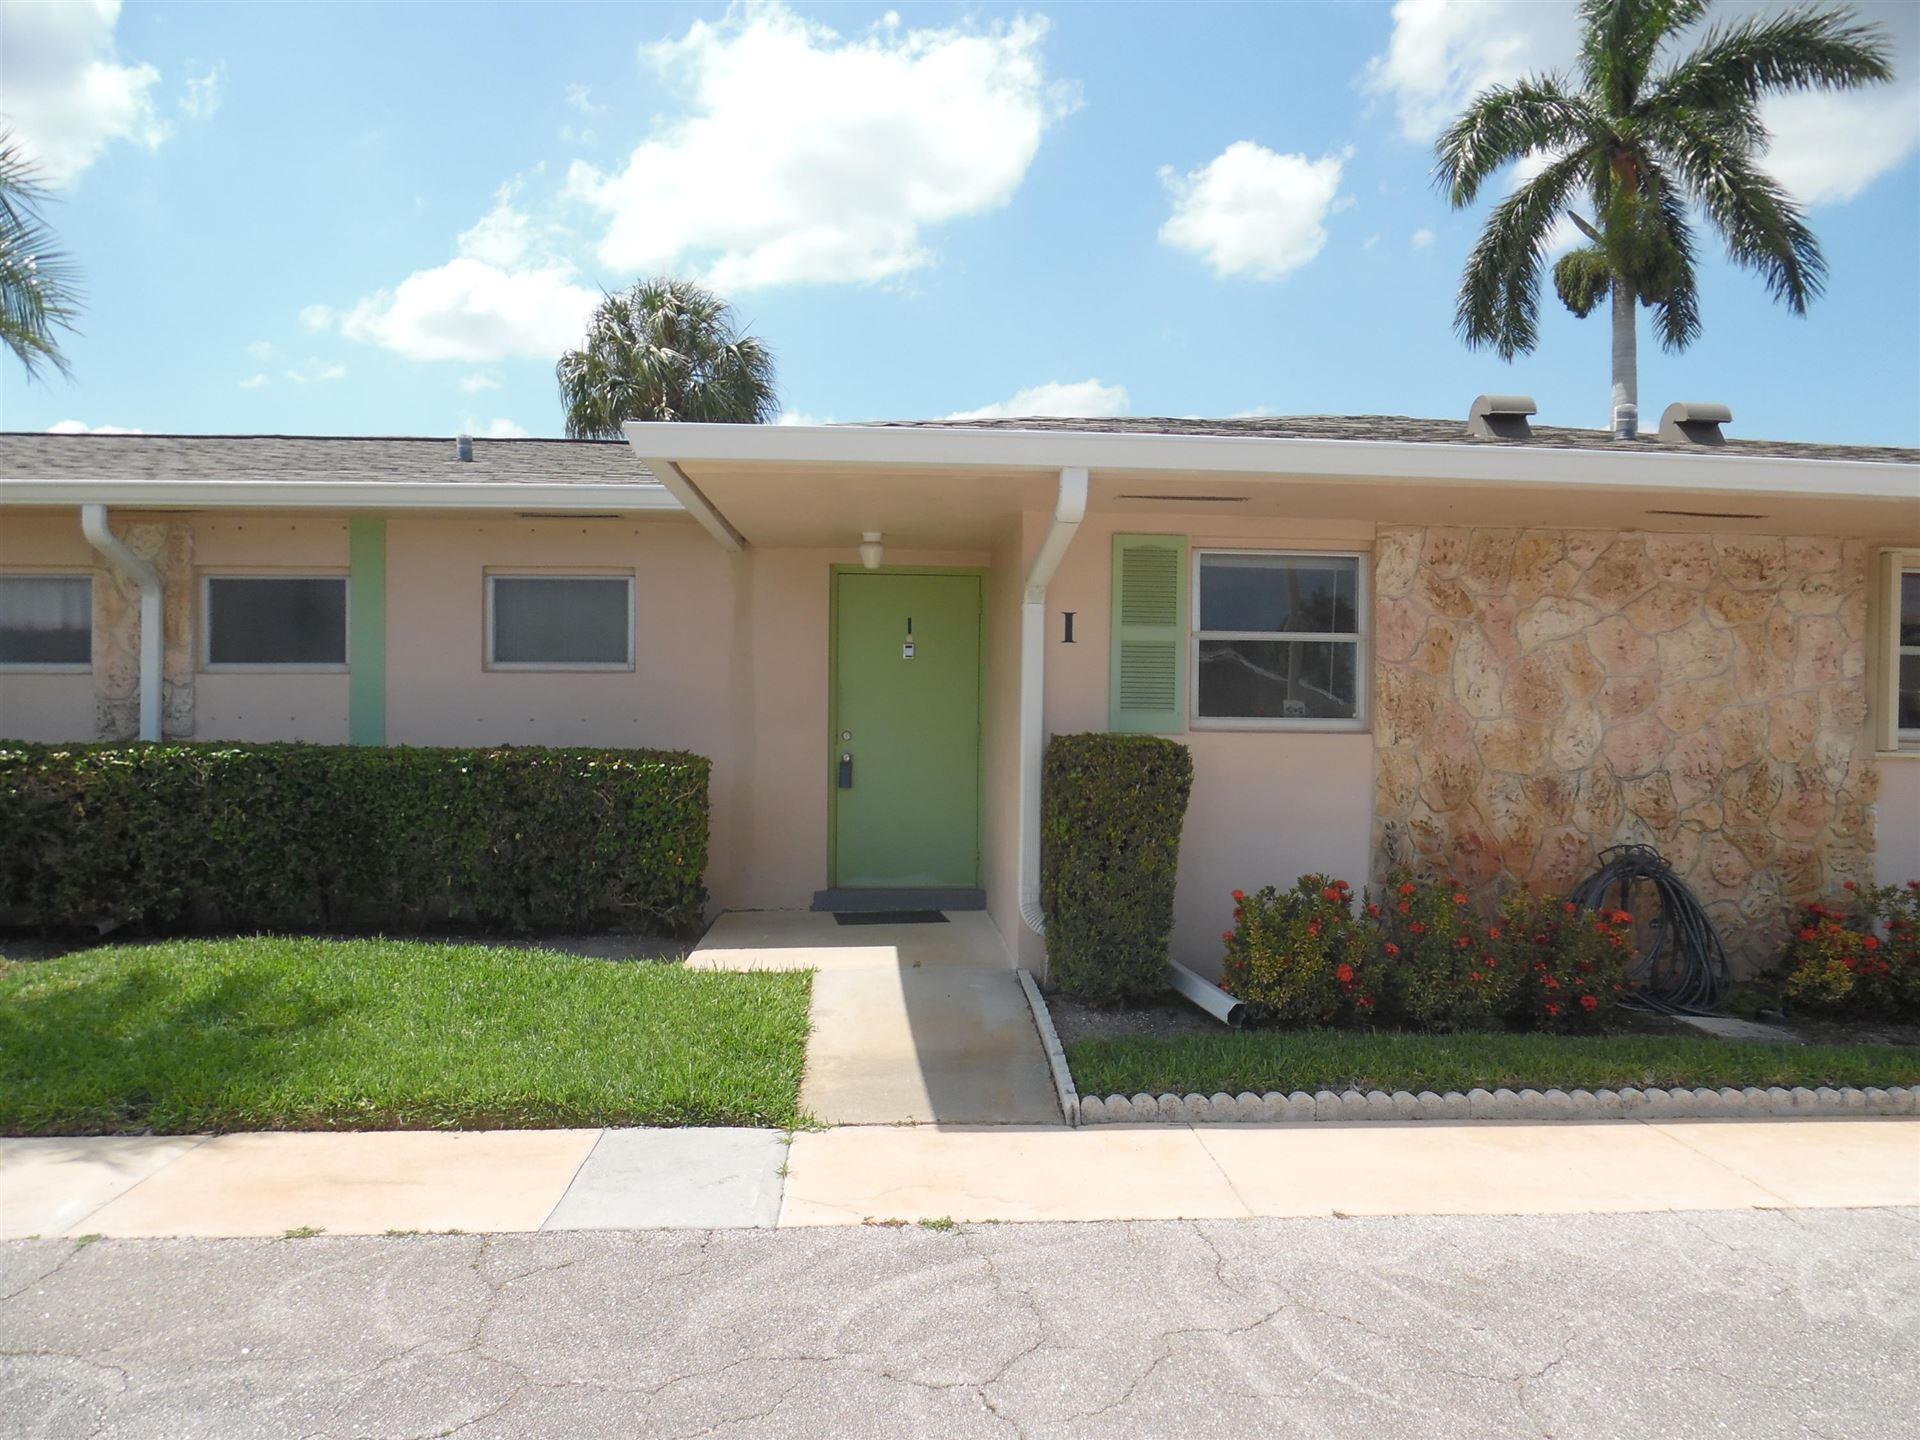 2640 Dudley Drive E #I, West Palm Beach, FL 33415 - MLS#: RX-10702134